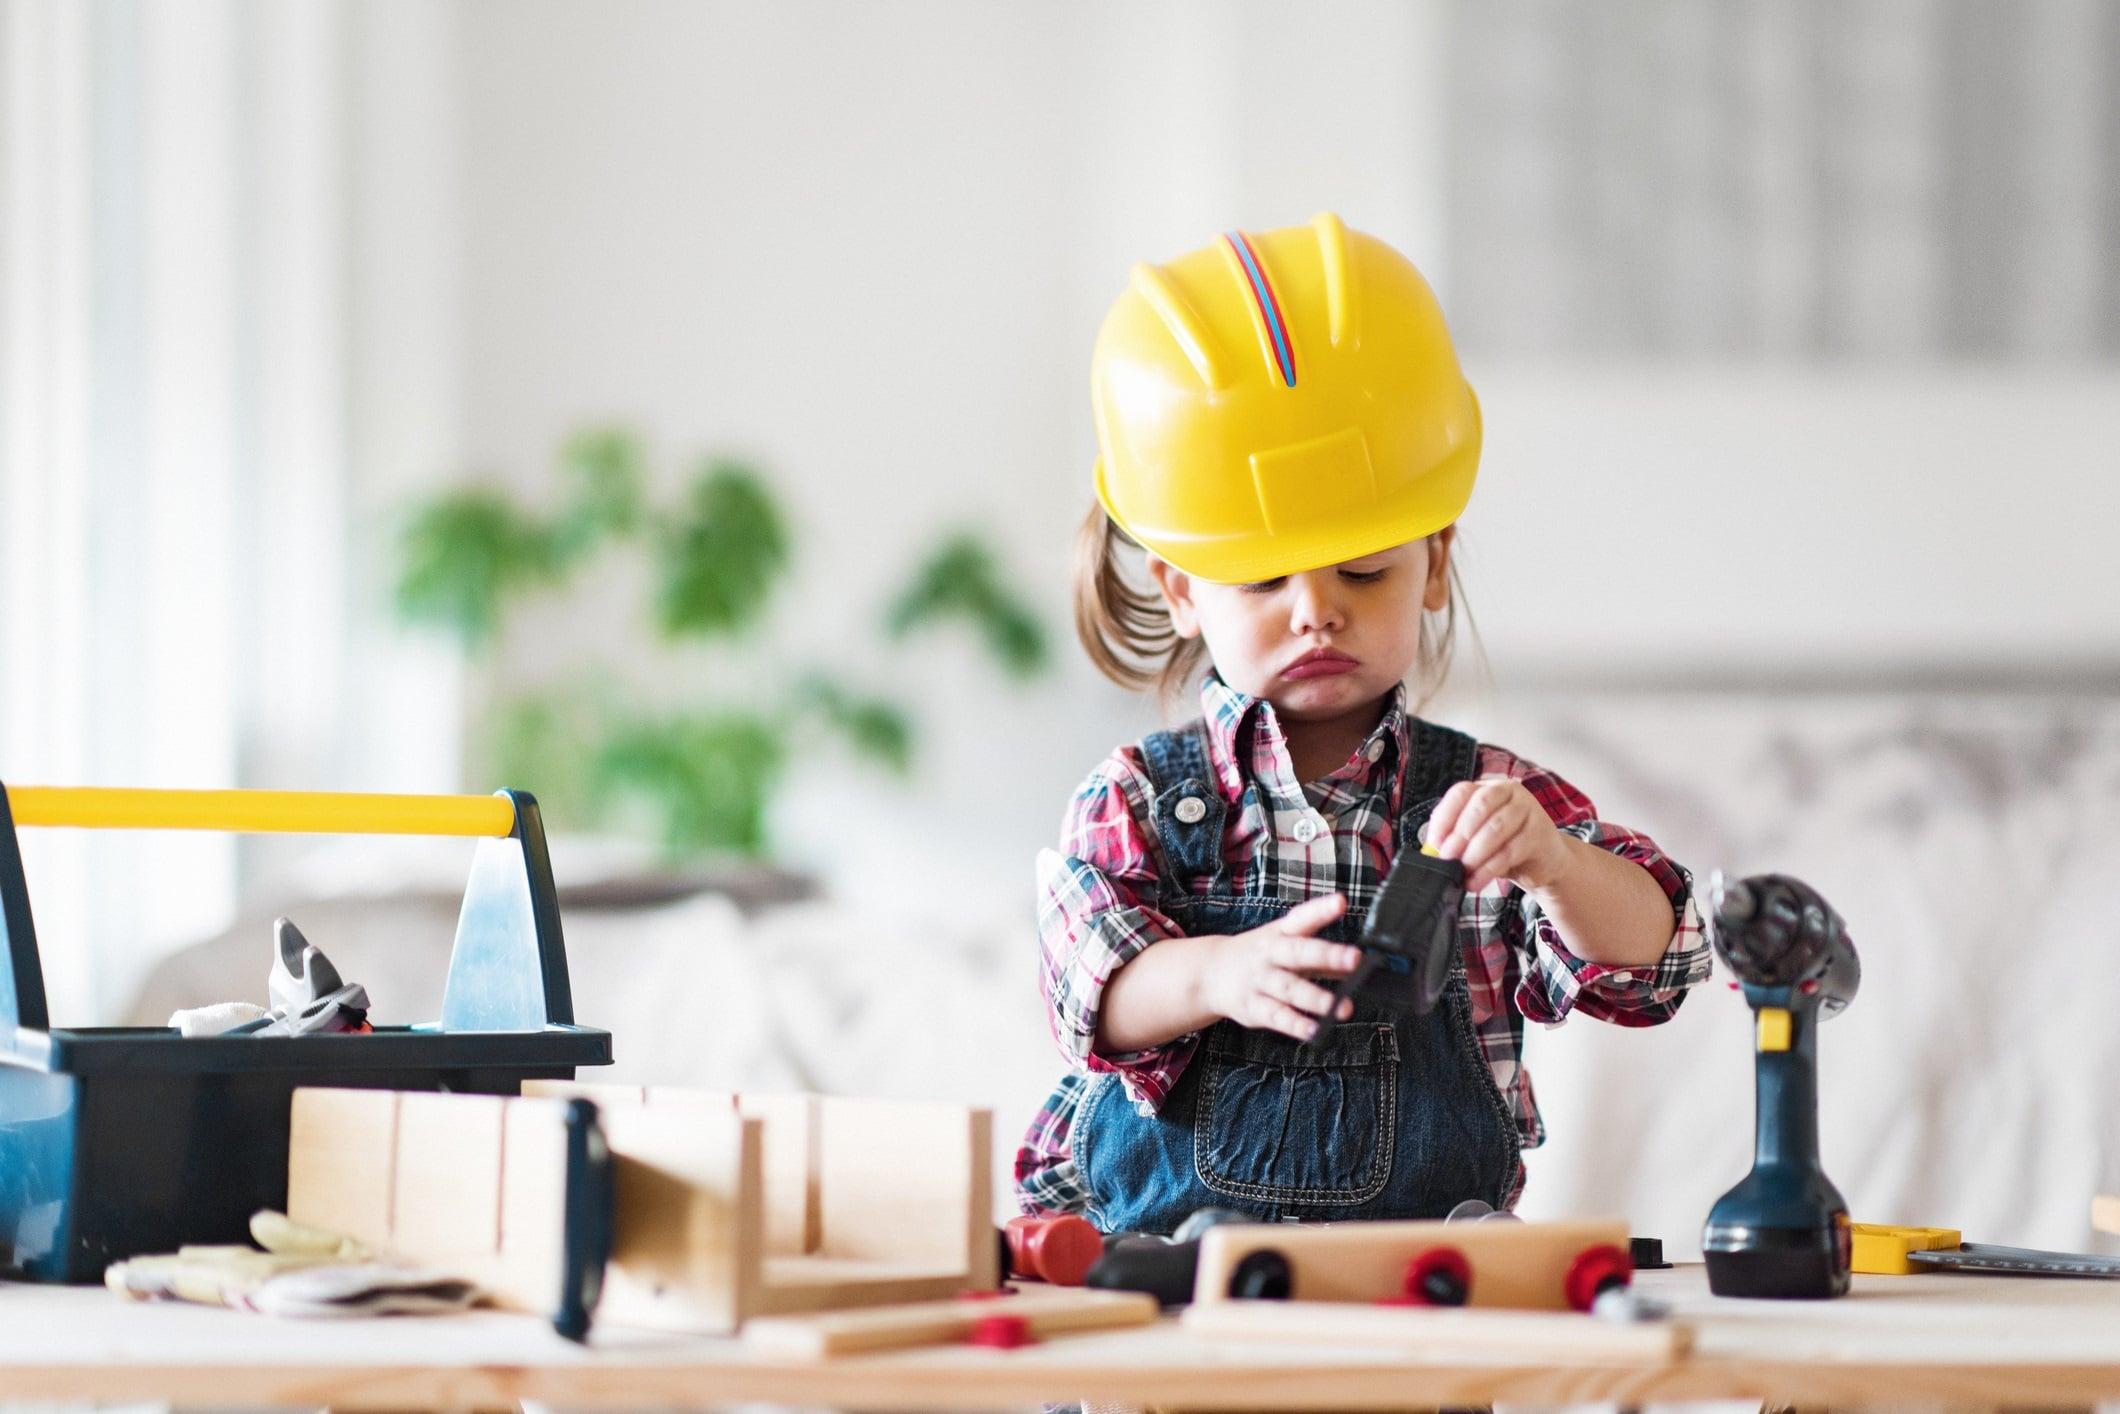 talleres-de-arquitectura-para-niños-en-Valencia-niña-jugando